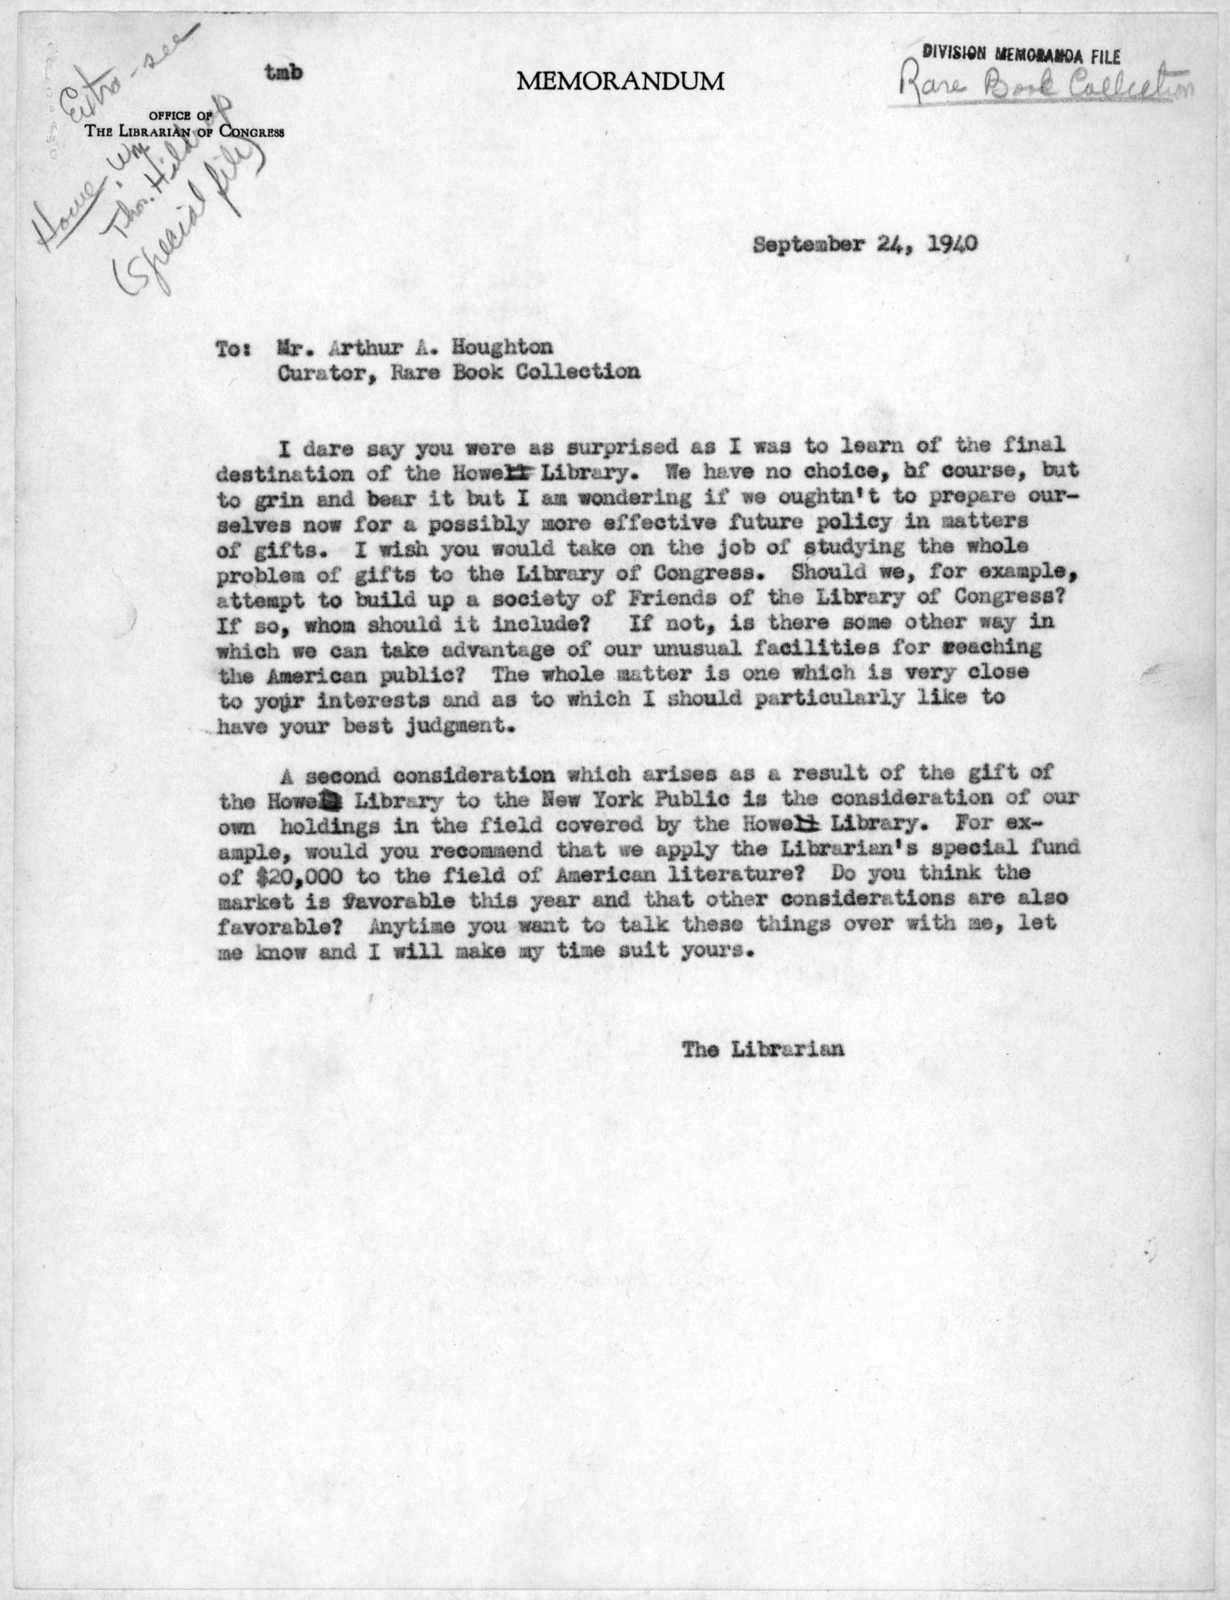 Memorandum From Archibald Macleish To Arthur A. Houghton, Jr., September  24, 1940